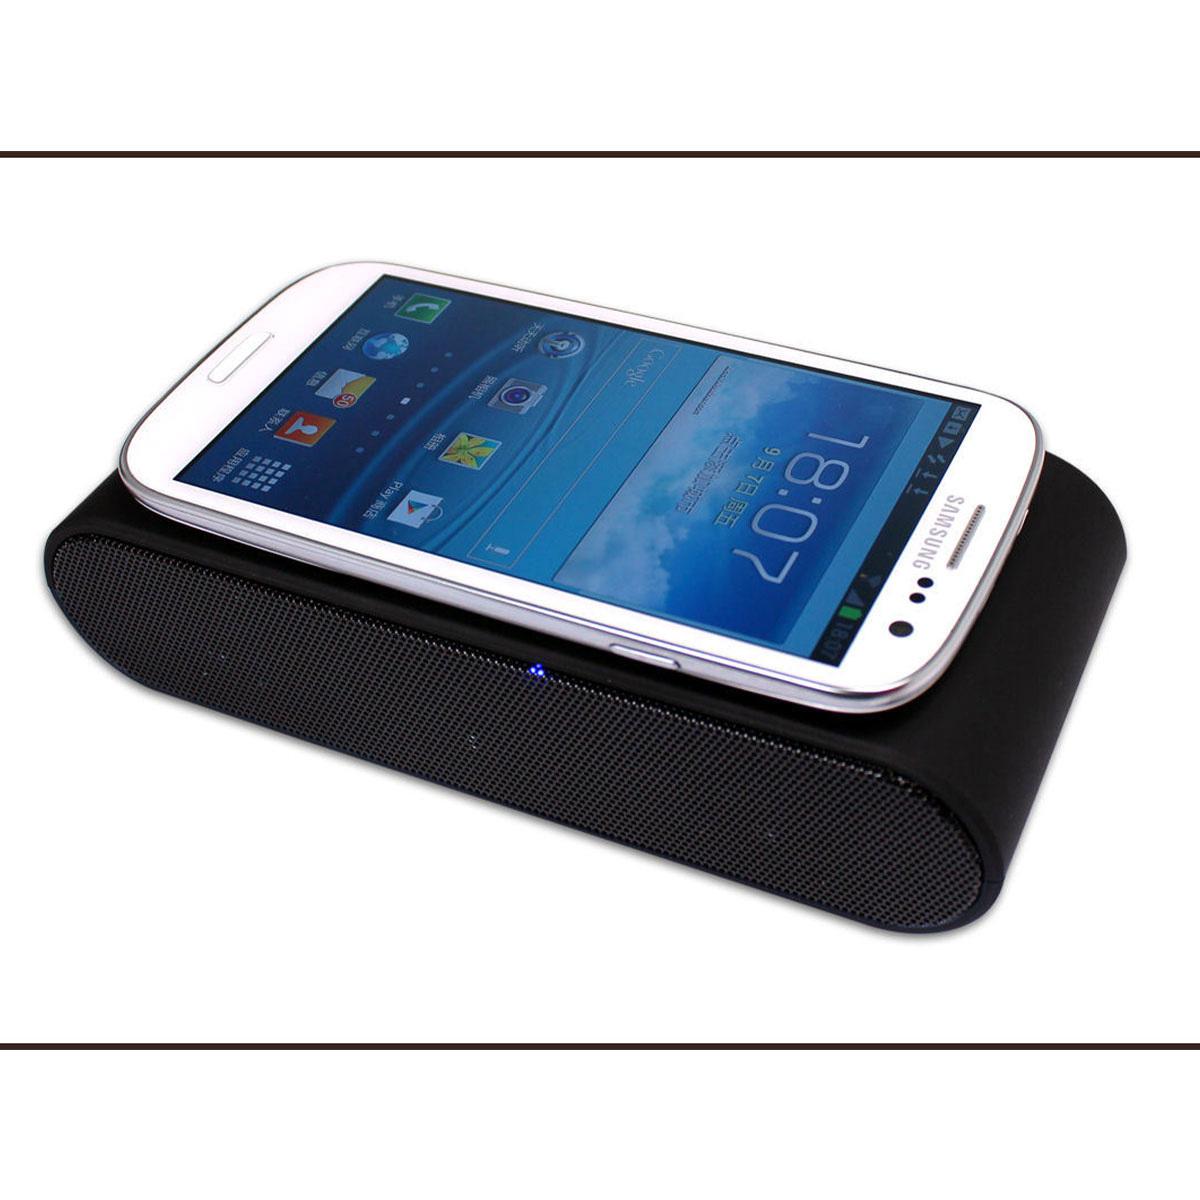 98-1108-01-mobiler-lautsprecher-für-smartphones-touchplay-upbeat-anwendung2-1200x1200px.jpg